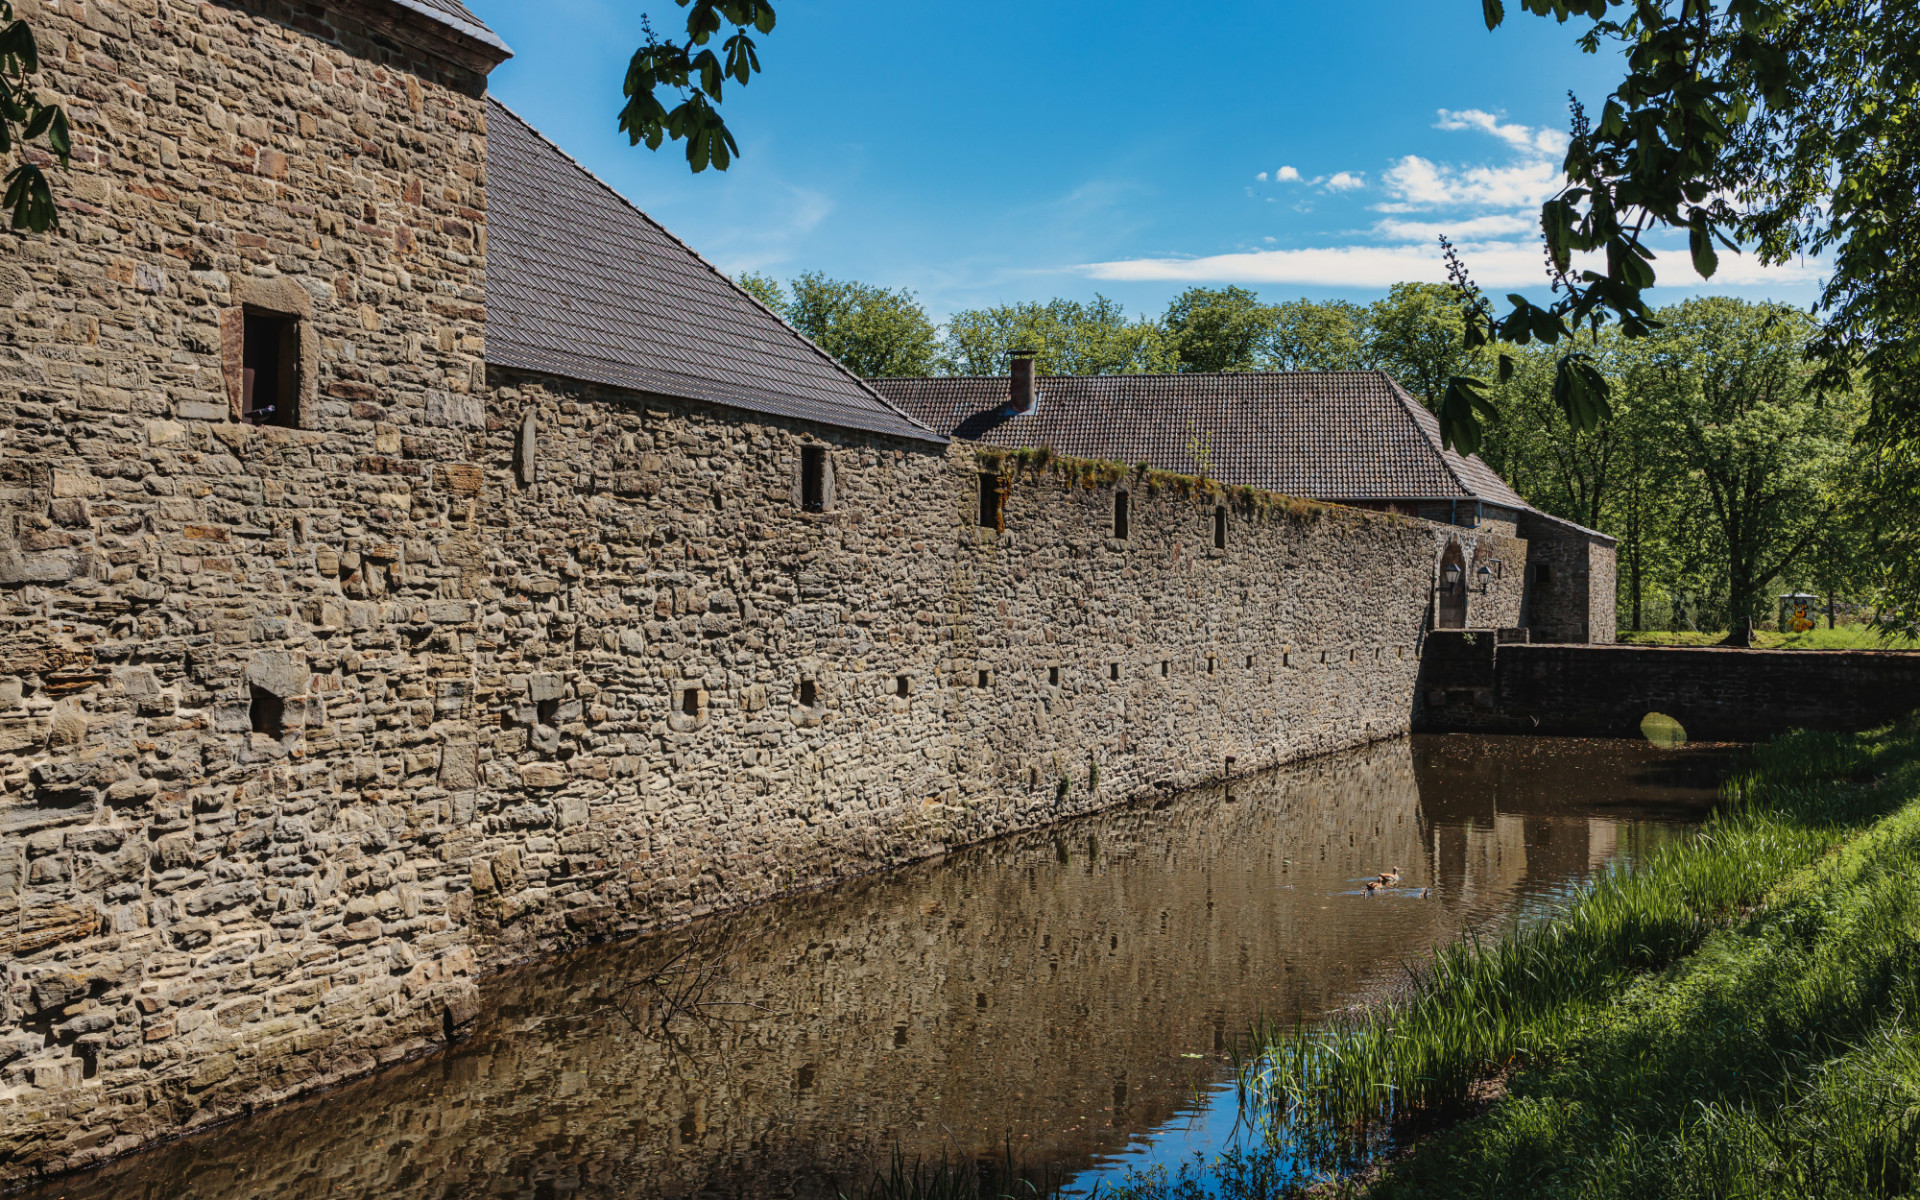 Haus Kemnade Castle